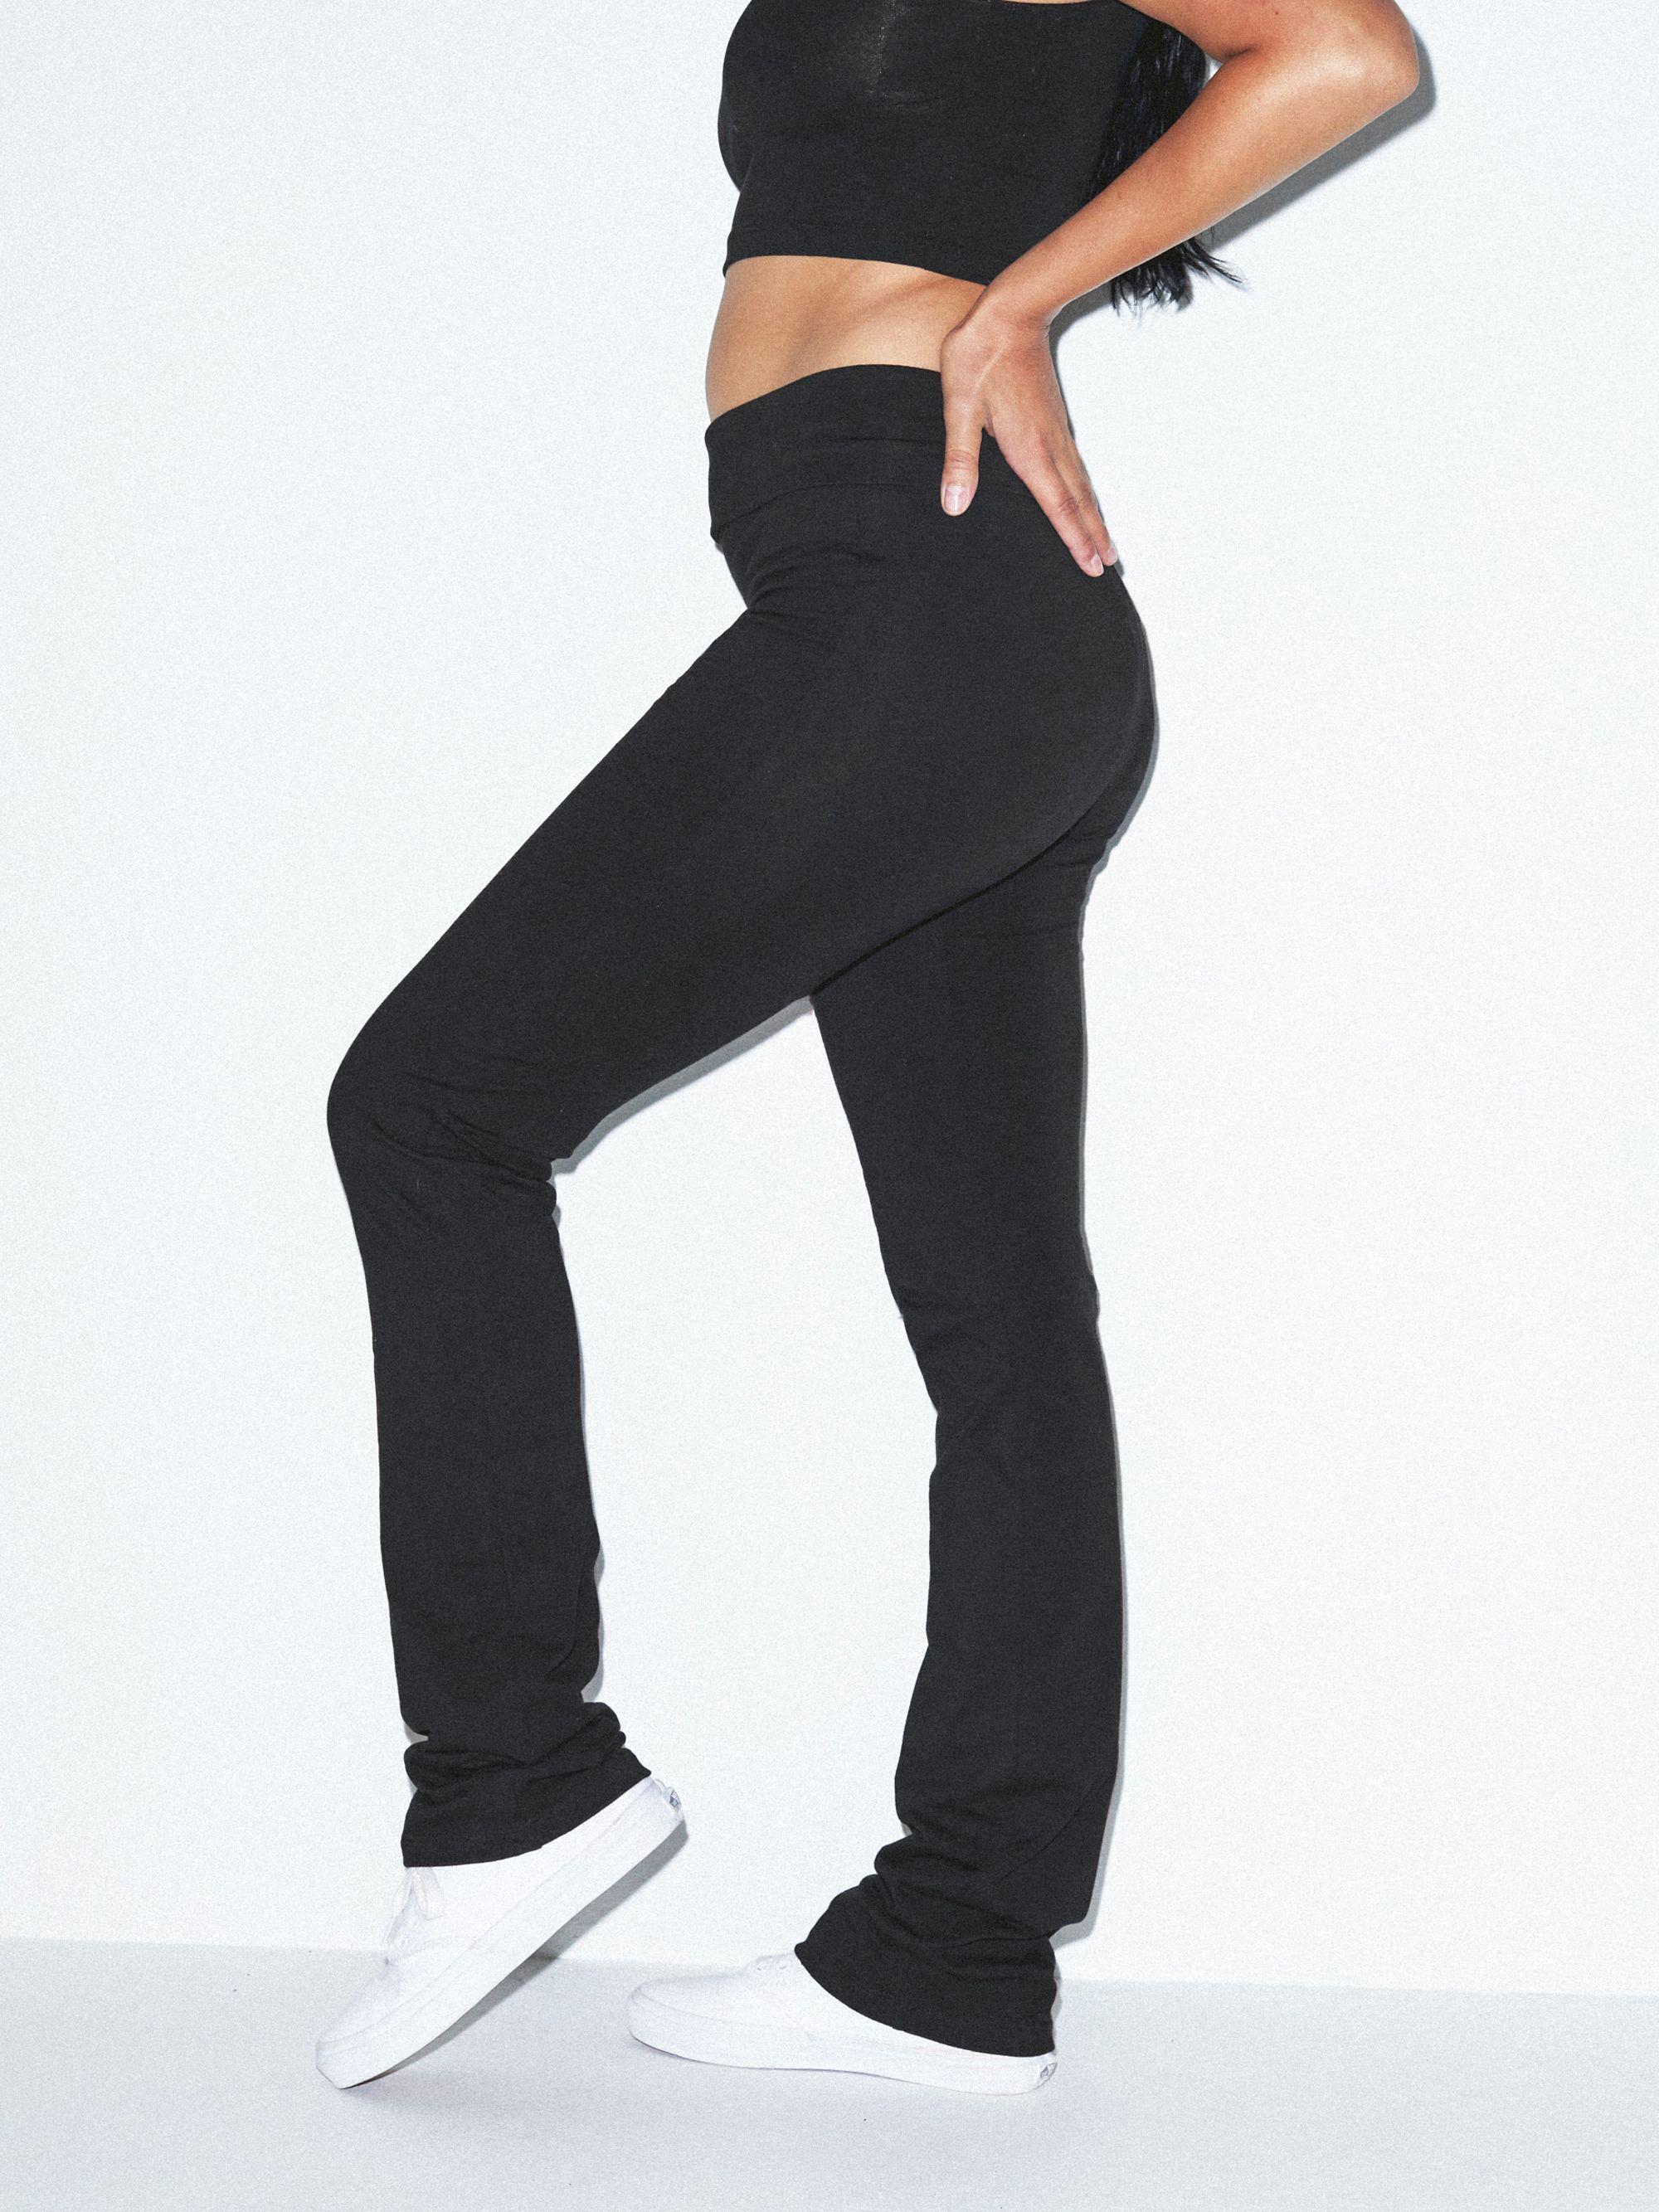 644eb457ba Cotton Spandex Jersey Straight Leg Yoga Pant | American Apparel